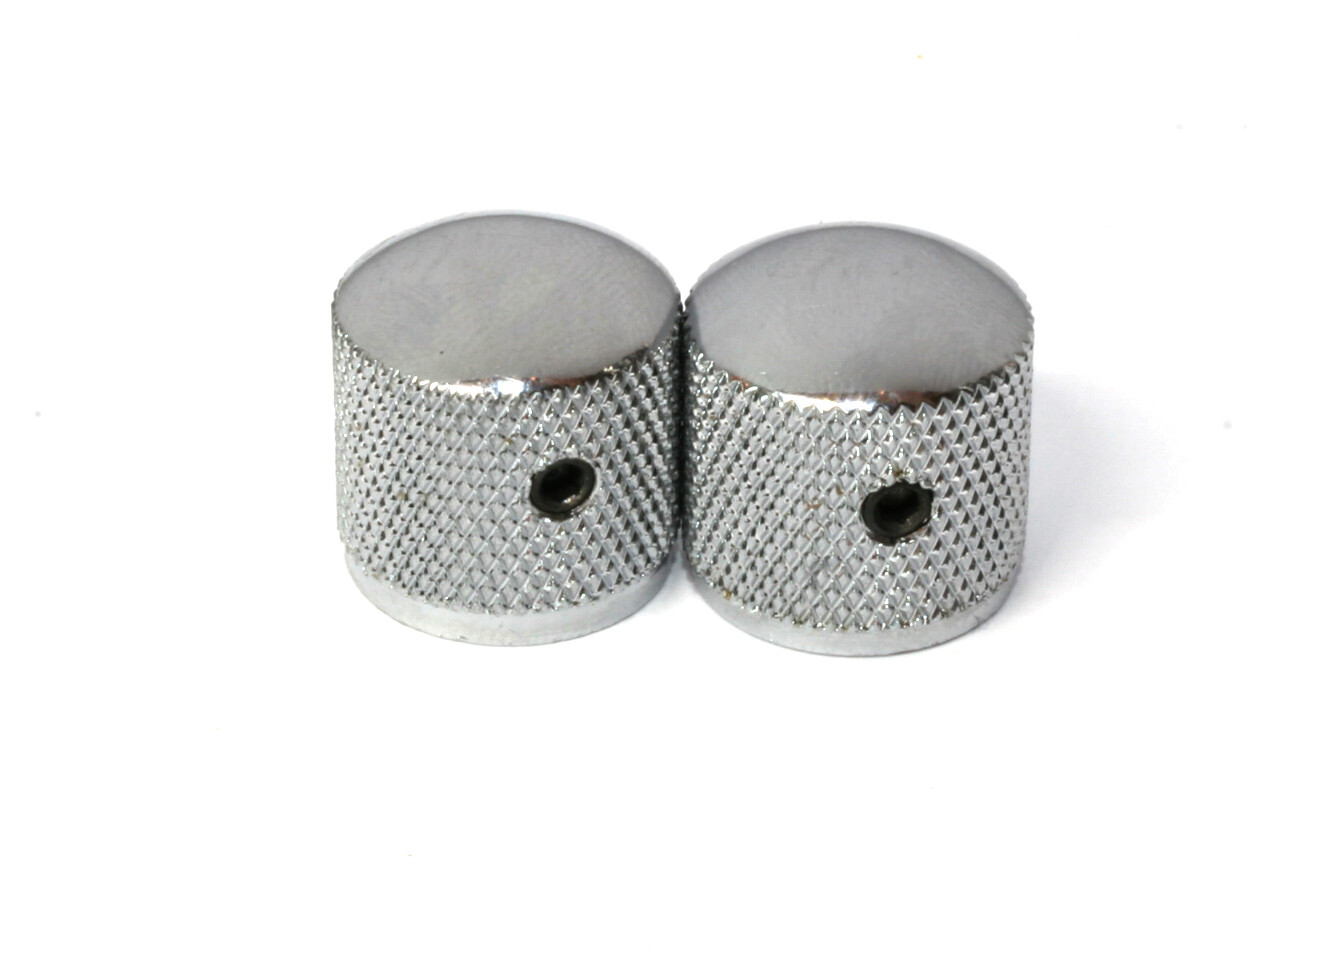 "Chrome Dome knobs (2), Gotoh, with set screw, fits USA split shaft pots, 23/32"" tall x 3/4"" wide."